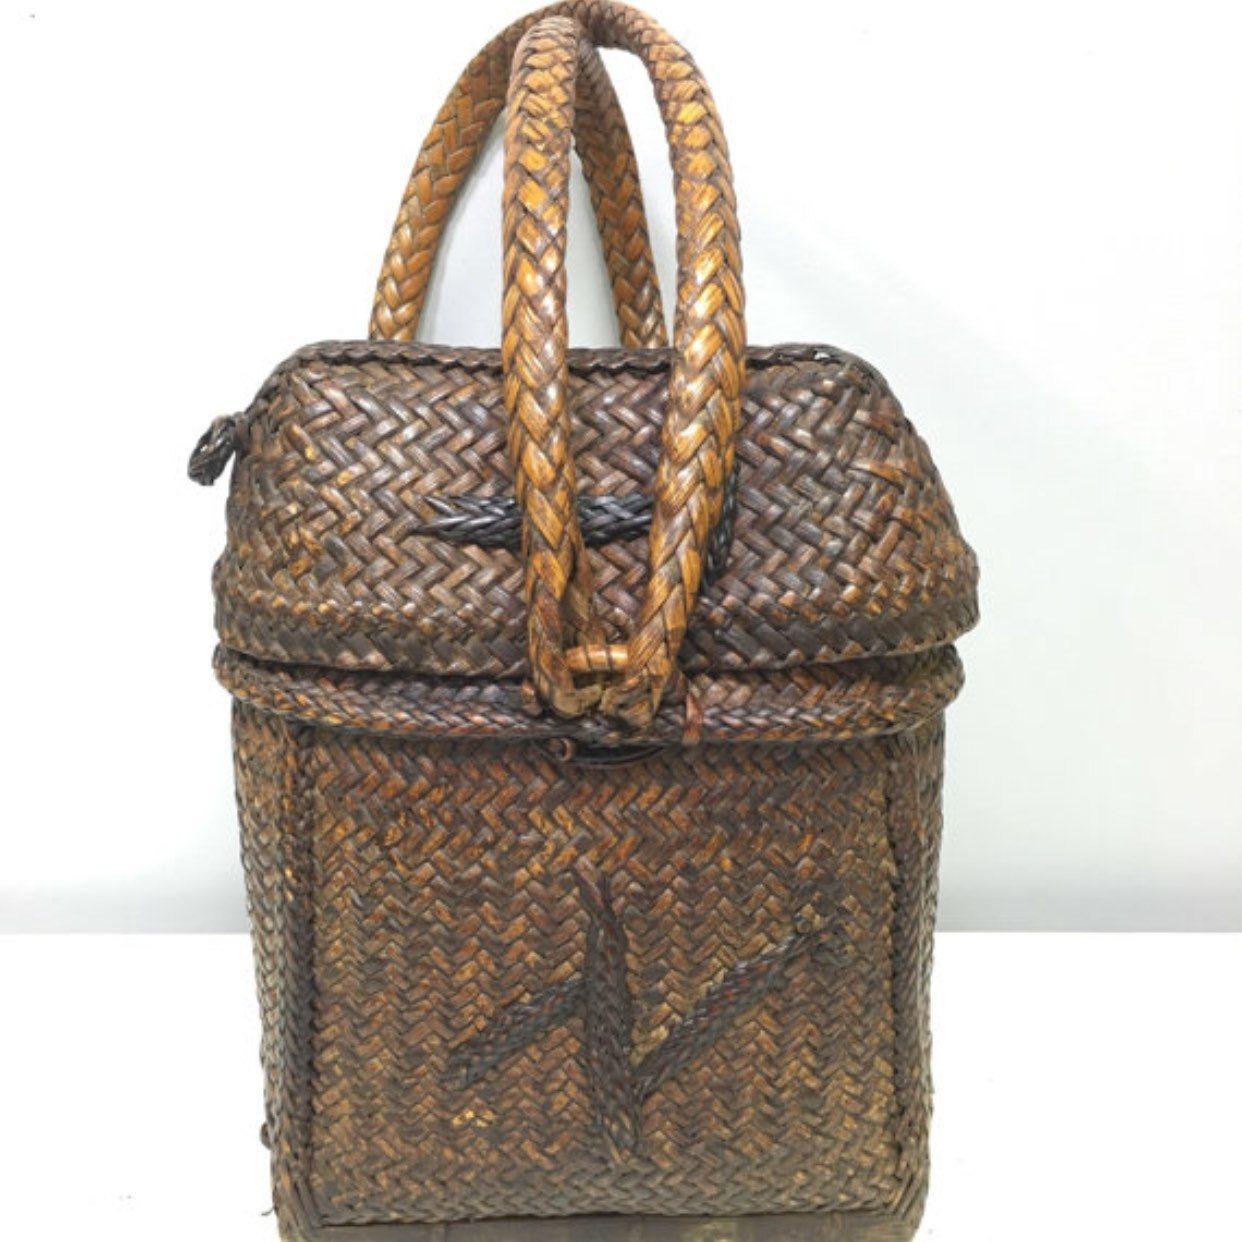 Handmade Philippines rattan backpack. Basket.